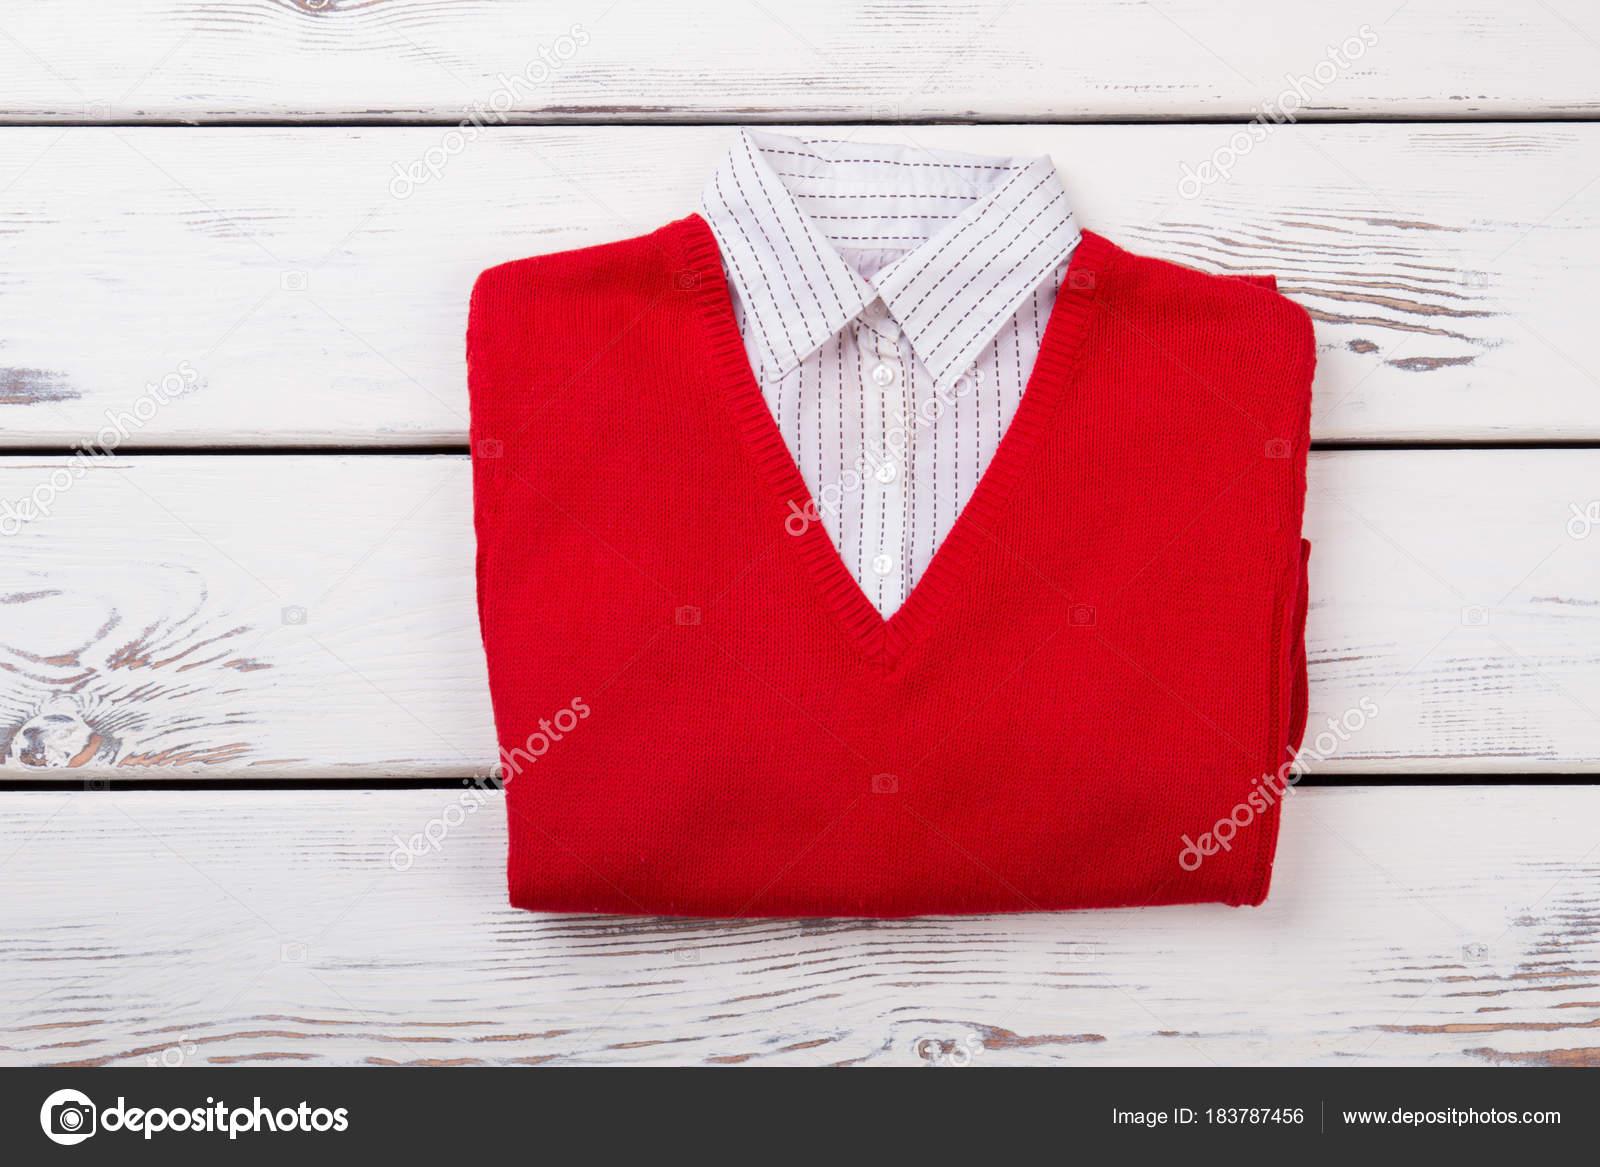 ea55cf8c72 Γυναικεία πουλόβερ κόκκινο με λευκό γιακά — Φωτογραφία Αρχείου ...